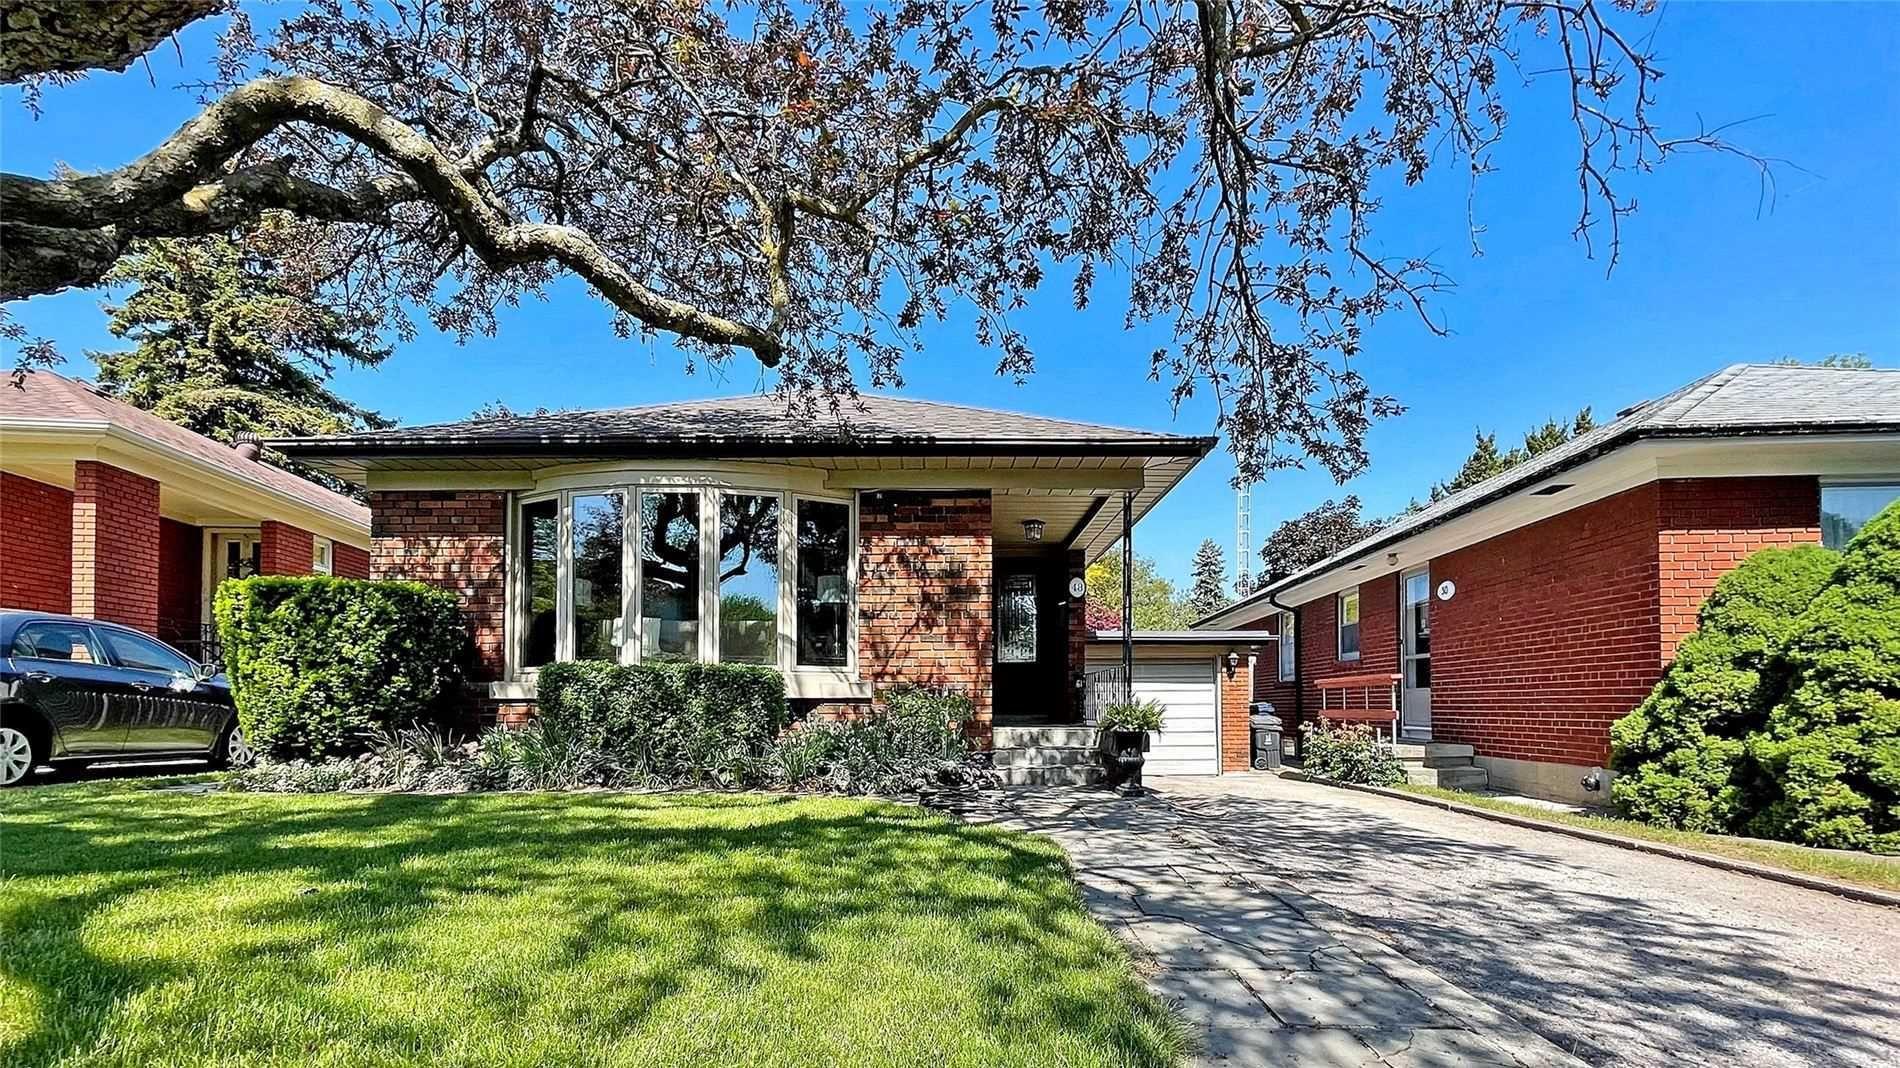 Main Photo: 48 Ferncroft Drive in Toronto: Birchcliffe-Cliffside House (Bungalow) for sale (Toronto E06)  : MLS®# E5257593